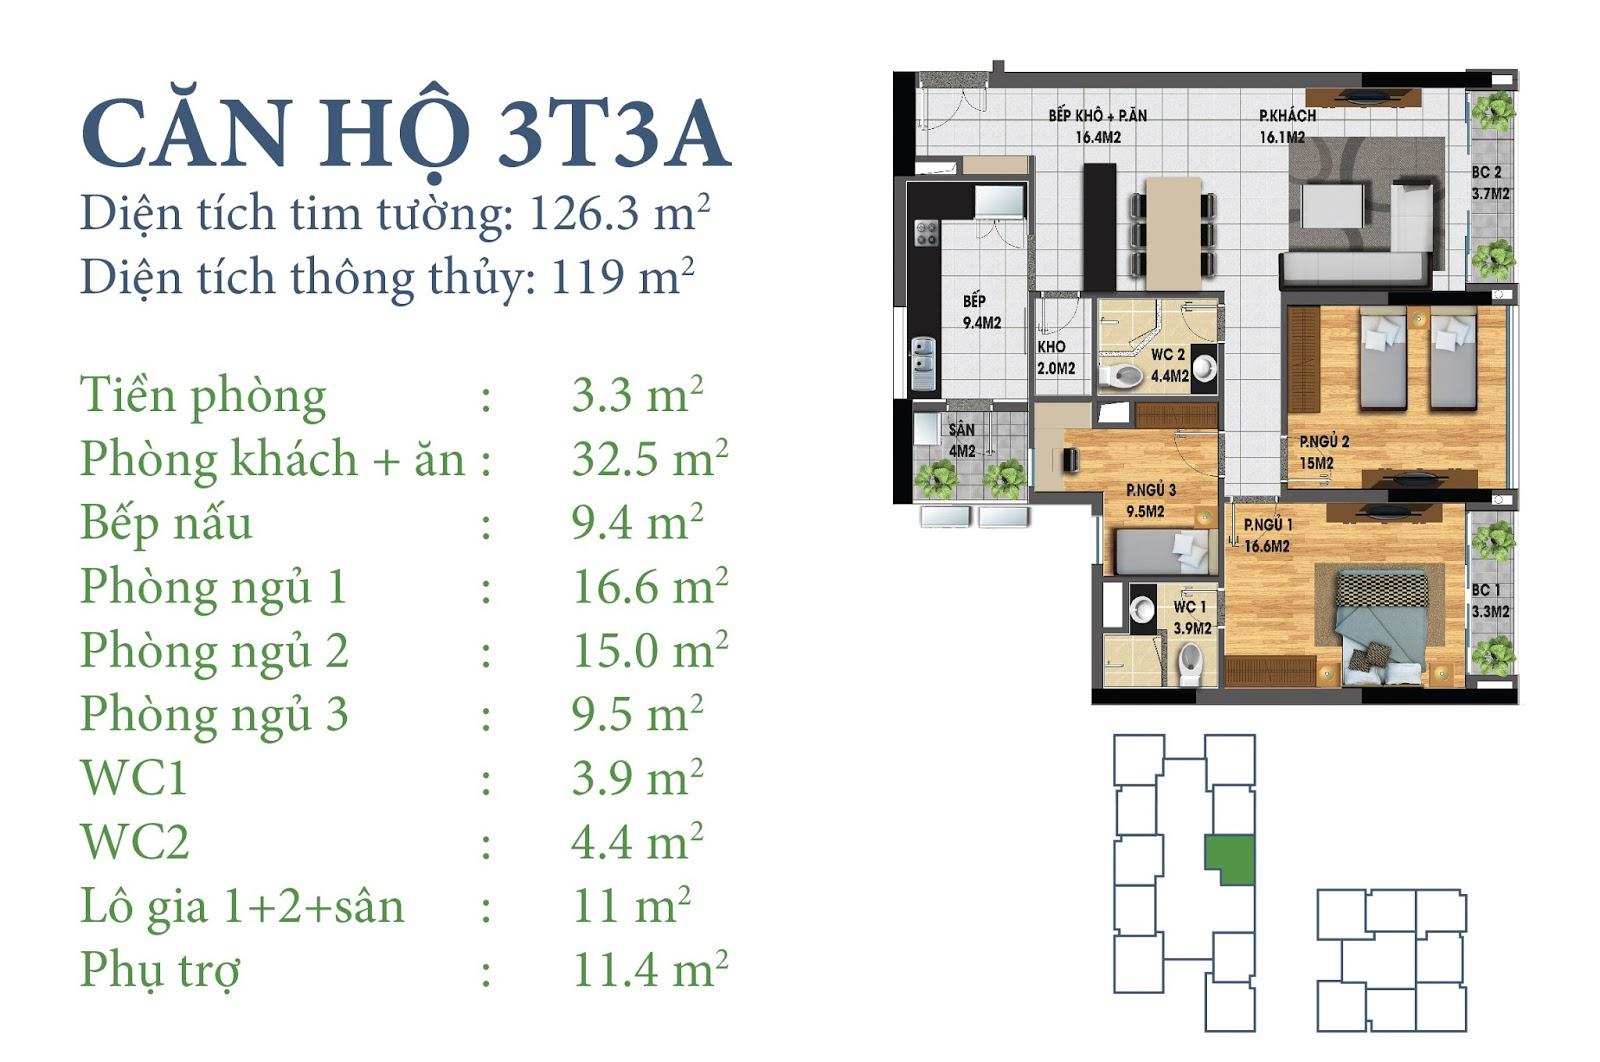 3T3A-horizon-tower-ngoai-giao-doan